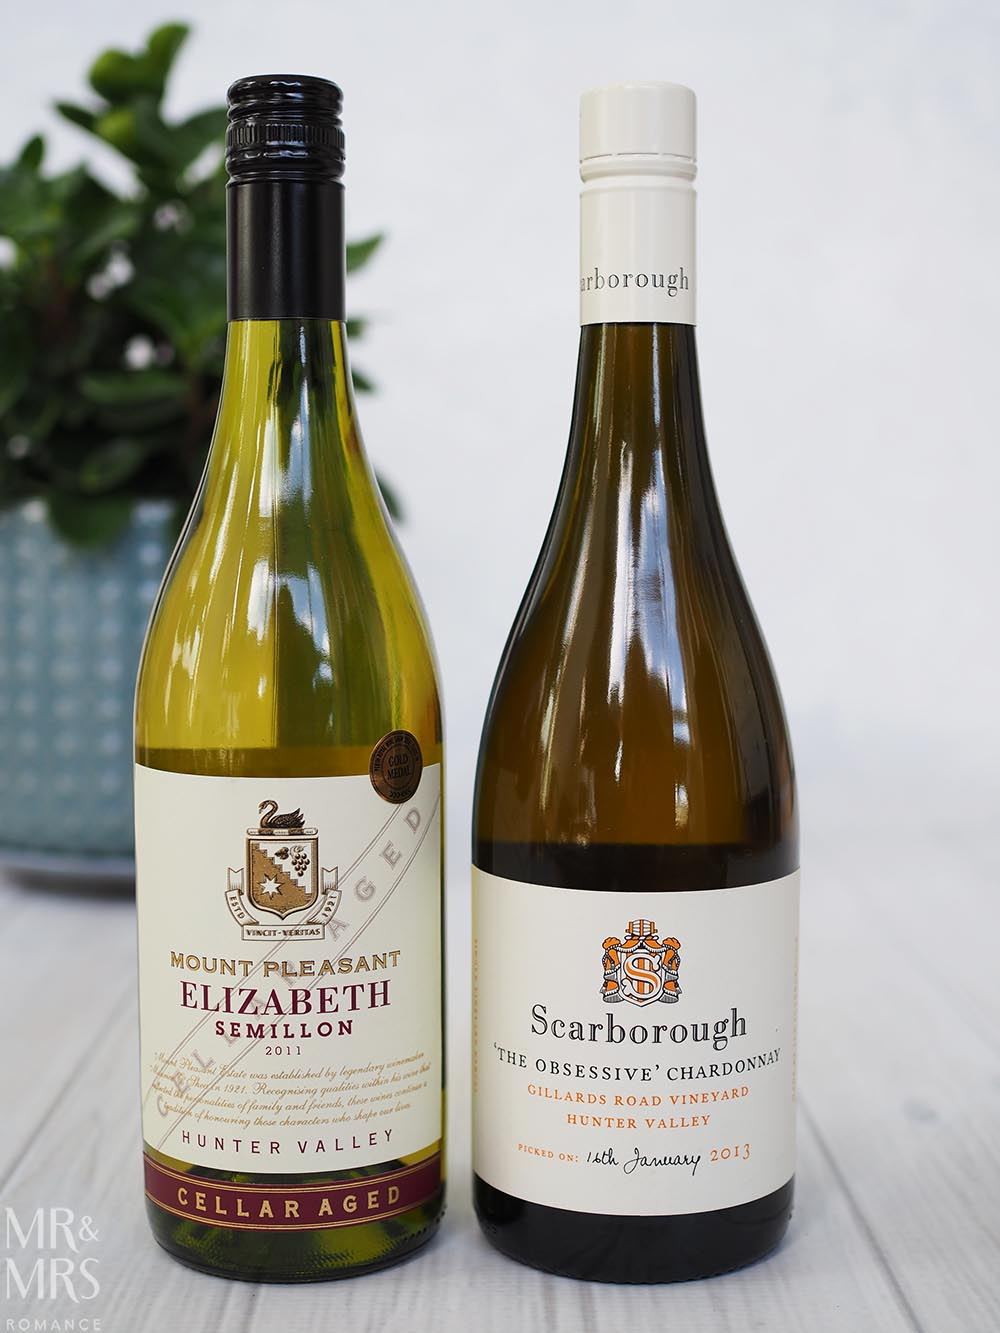 Wine trends - Mount Pleasant Estate Elizabeth Semillon, Scarborough Obsessive Chardonnay